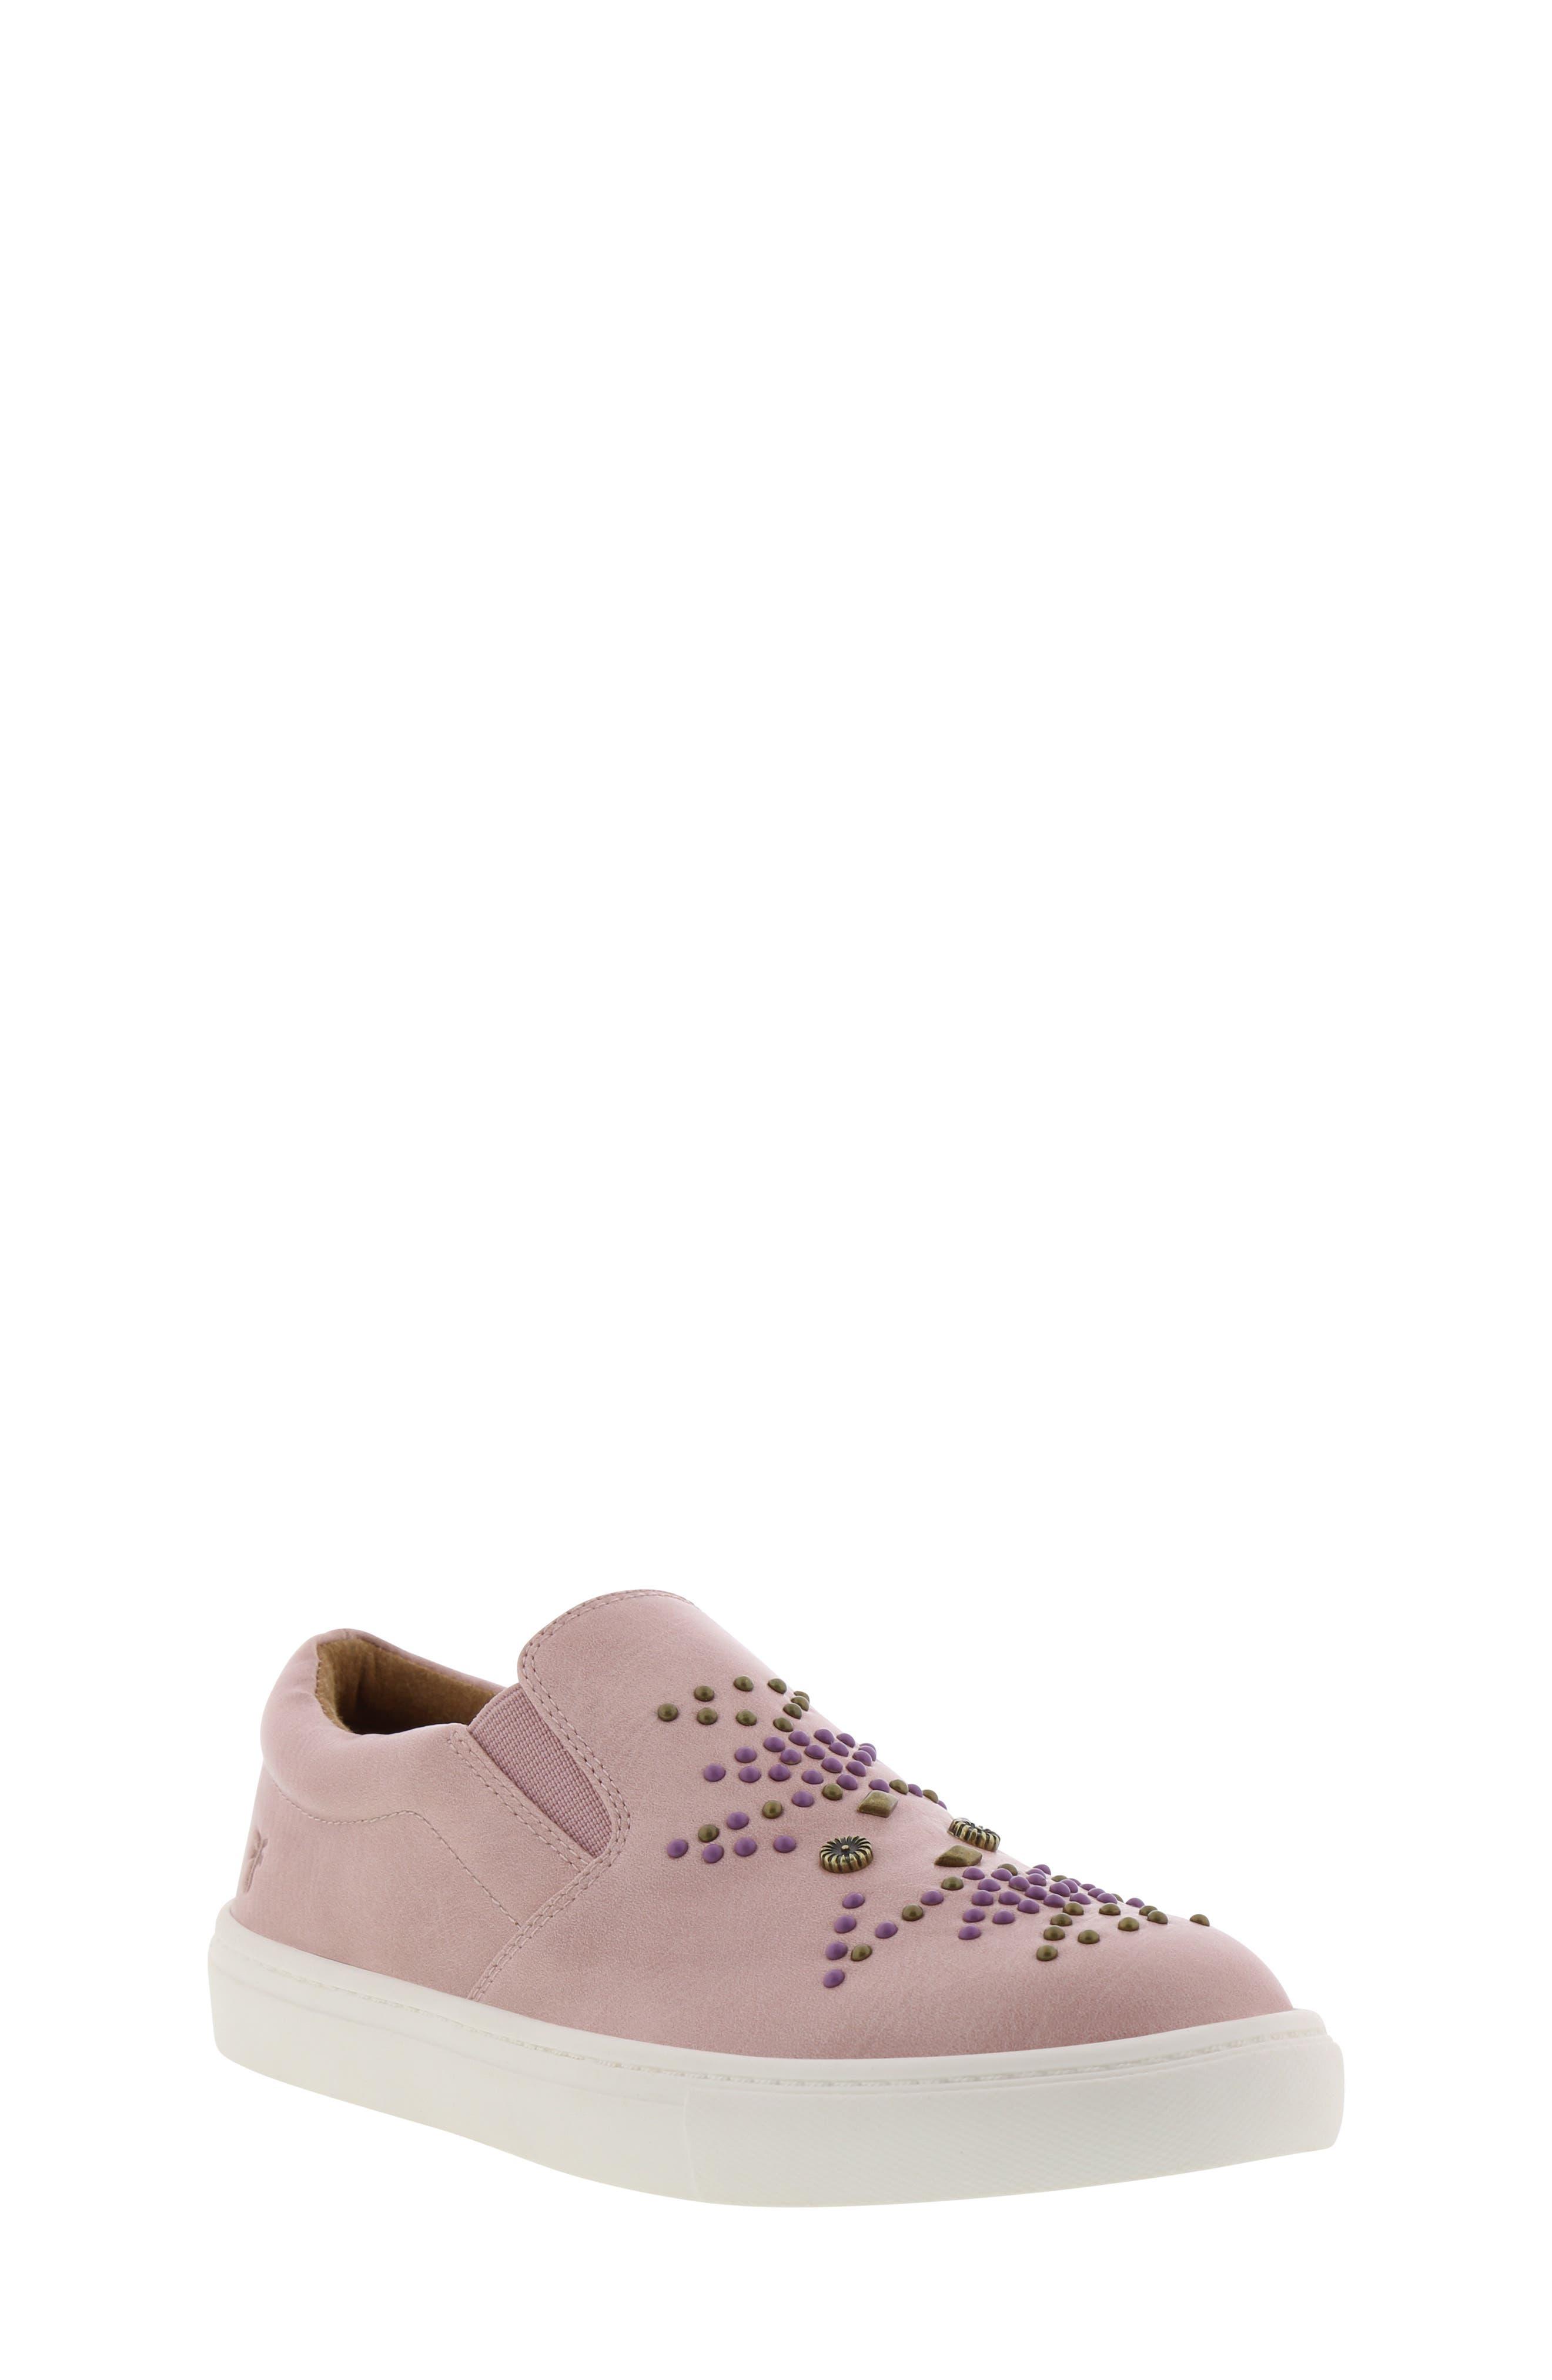 FRYE, Lena Studded Sneaker, Main thumbnail 1, color, 686